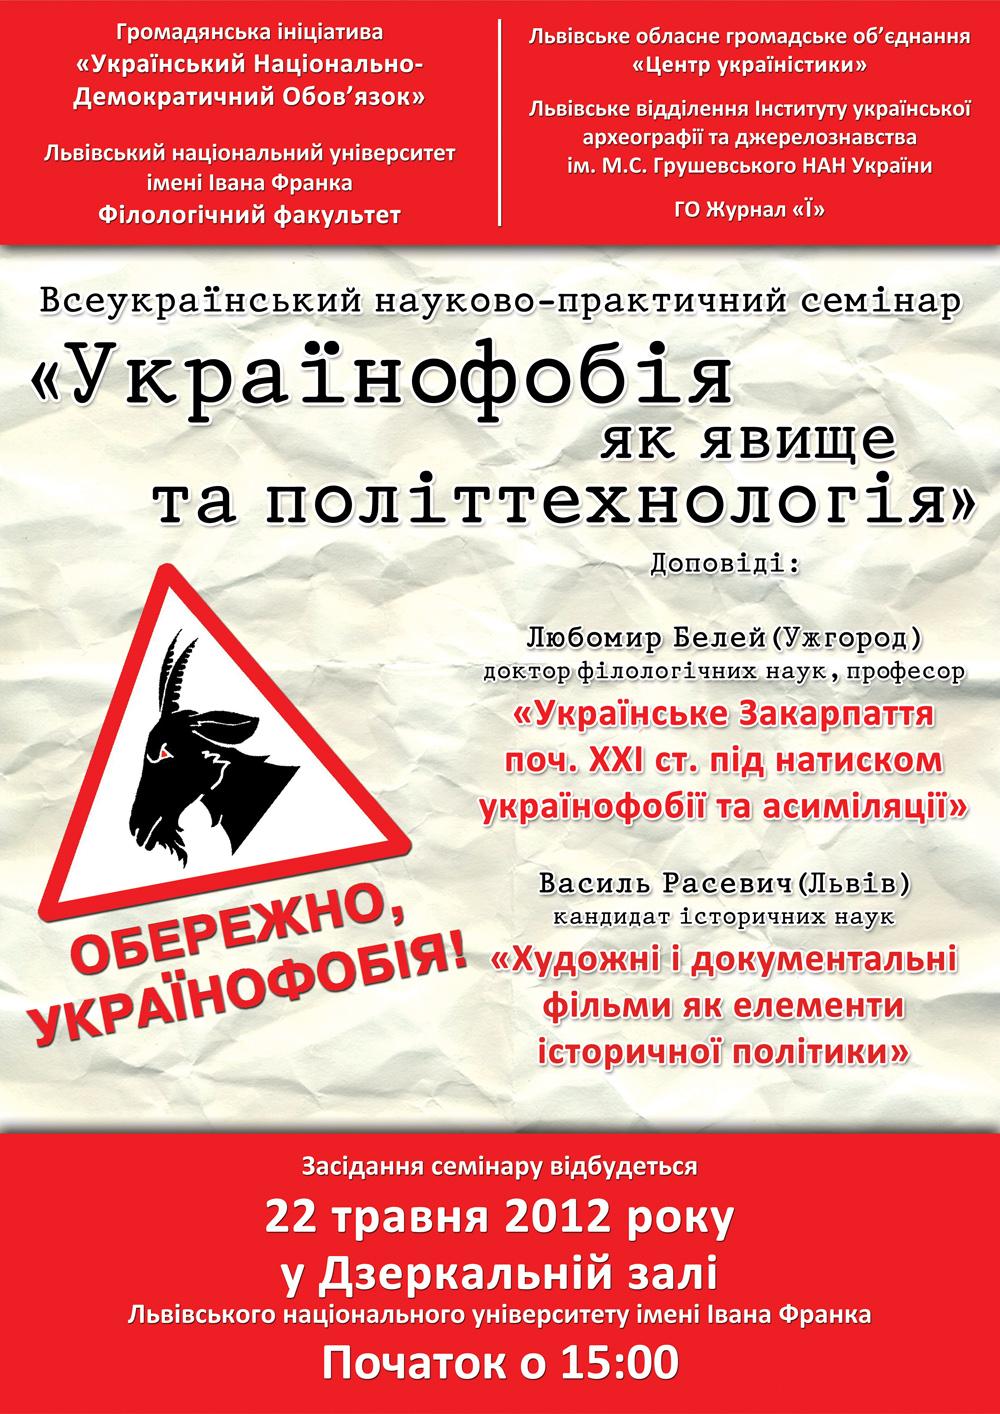 Ukrainofobiya